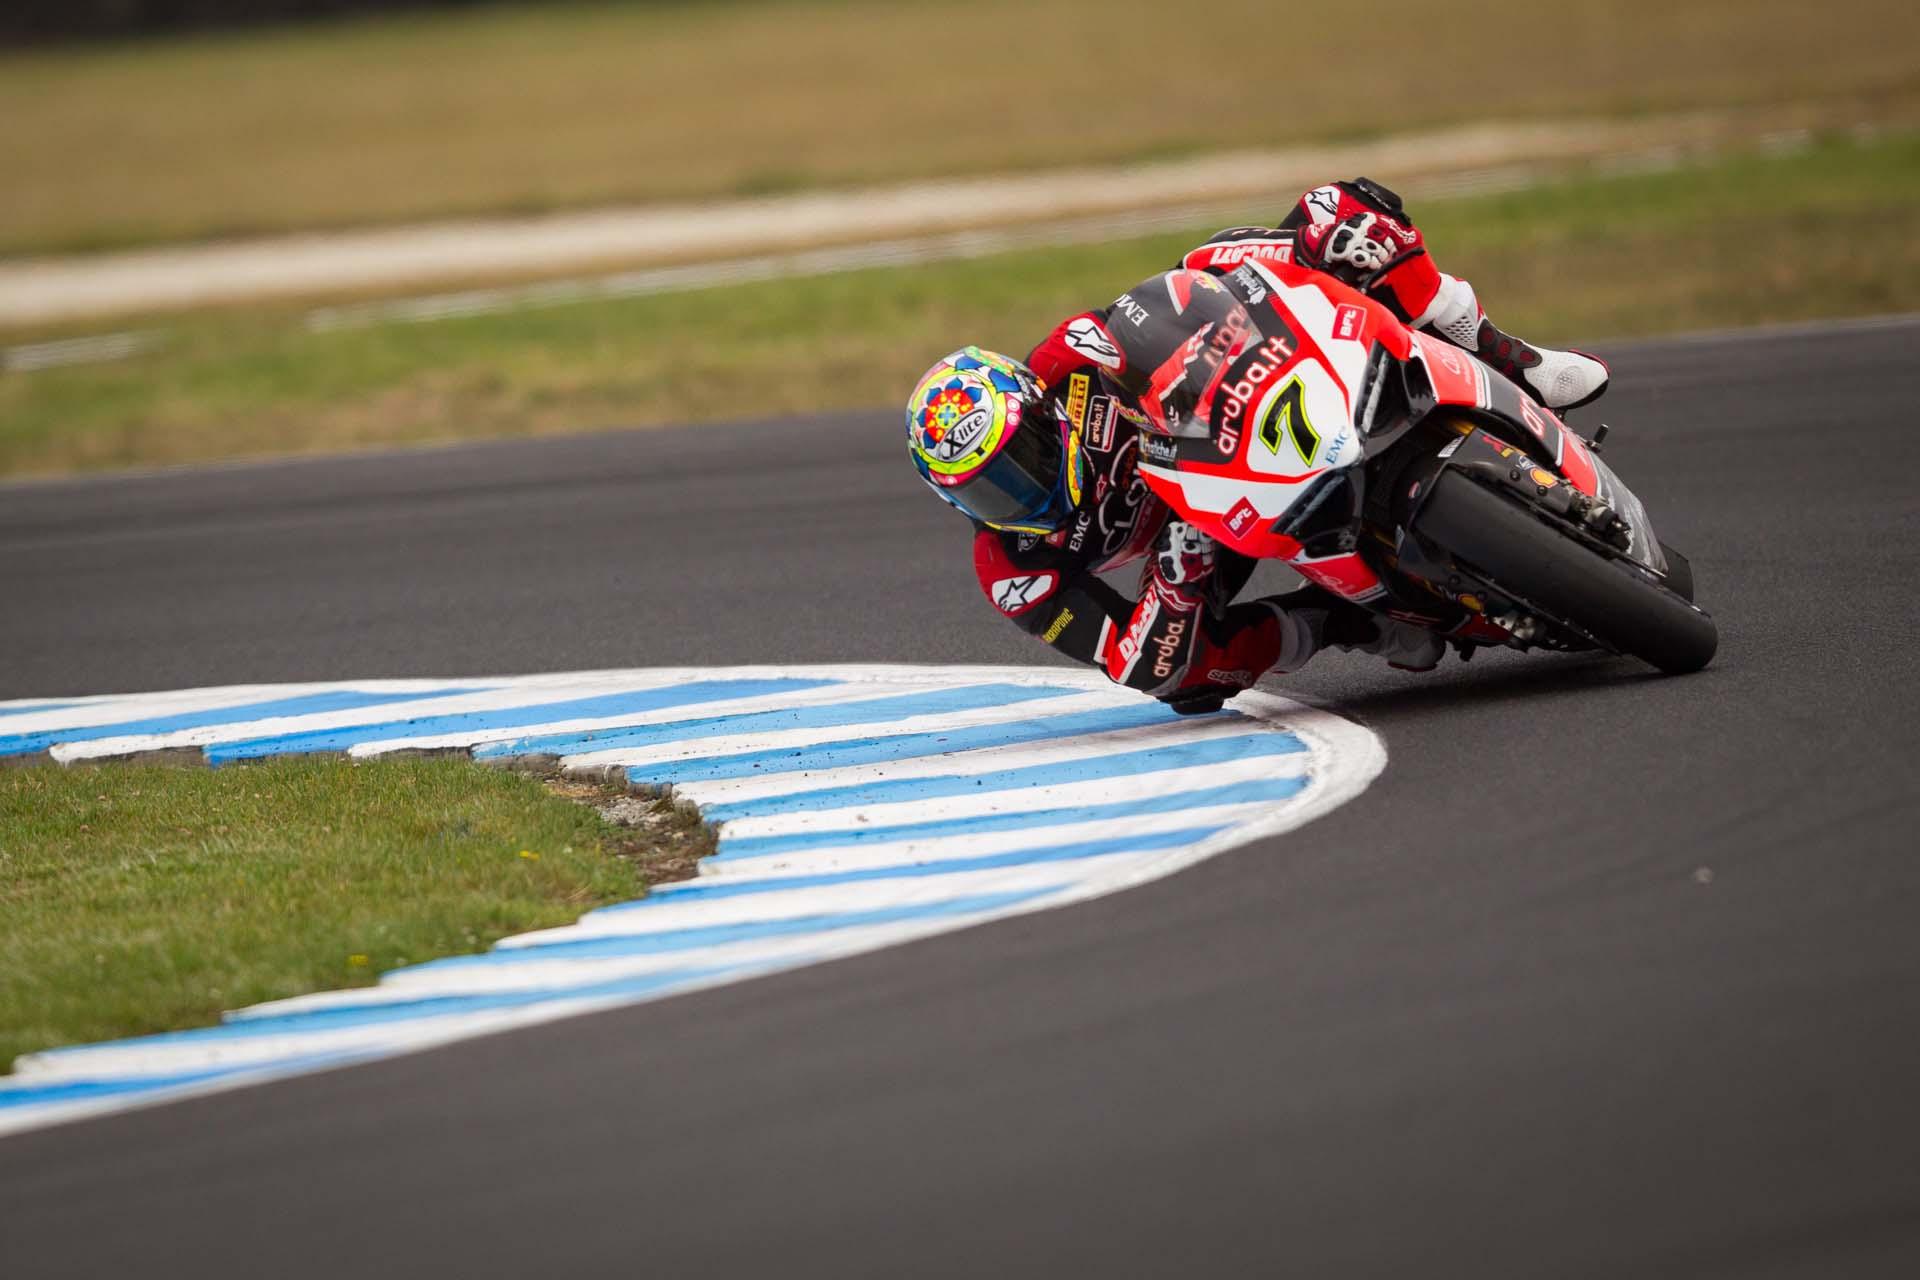 [WSBK] Phillip Island 2015-World-Superbike-Phillip-Island-Anant-Deboor-13